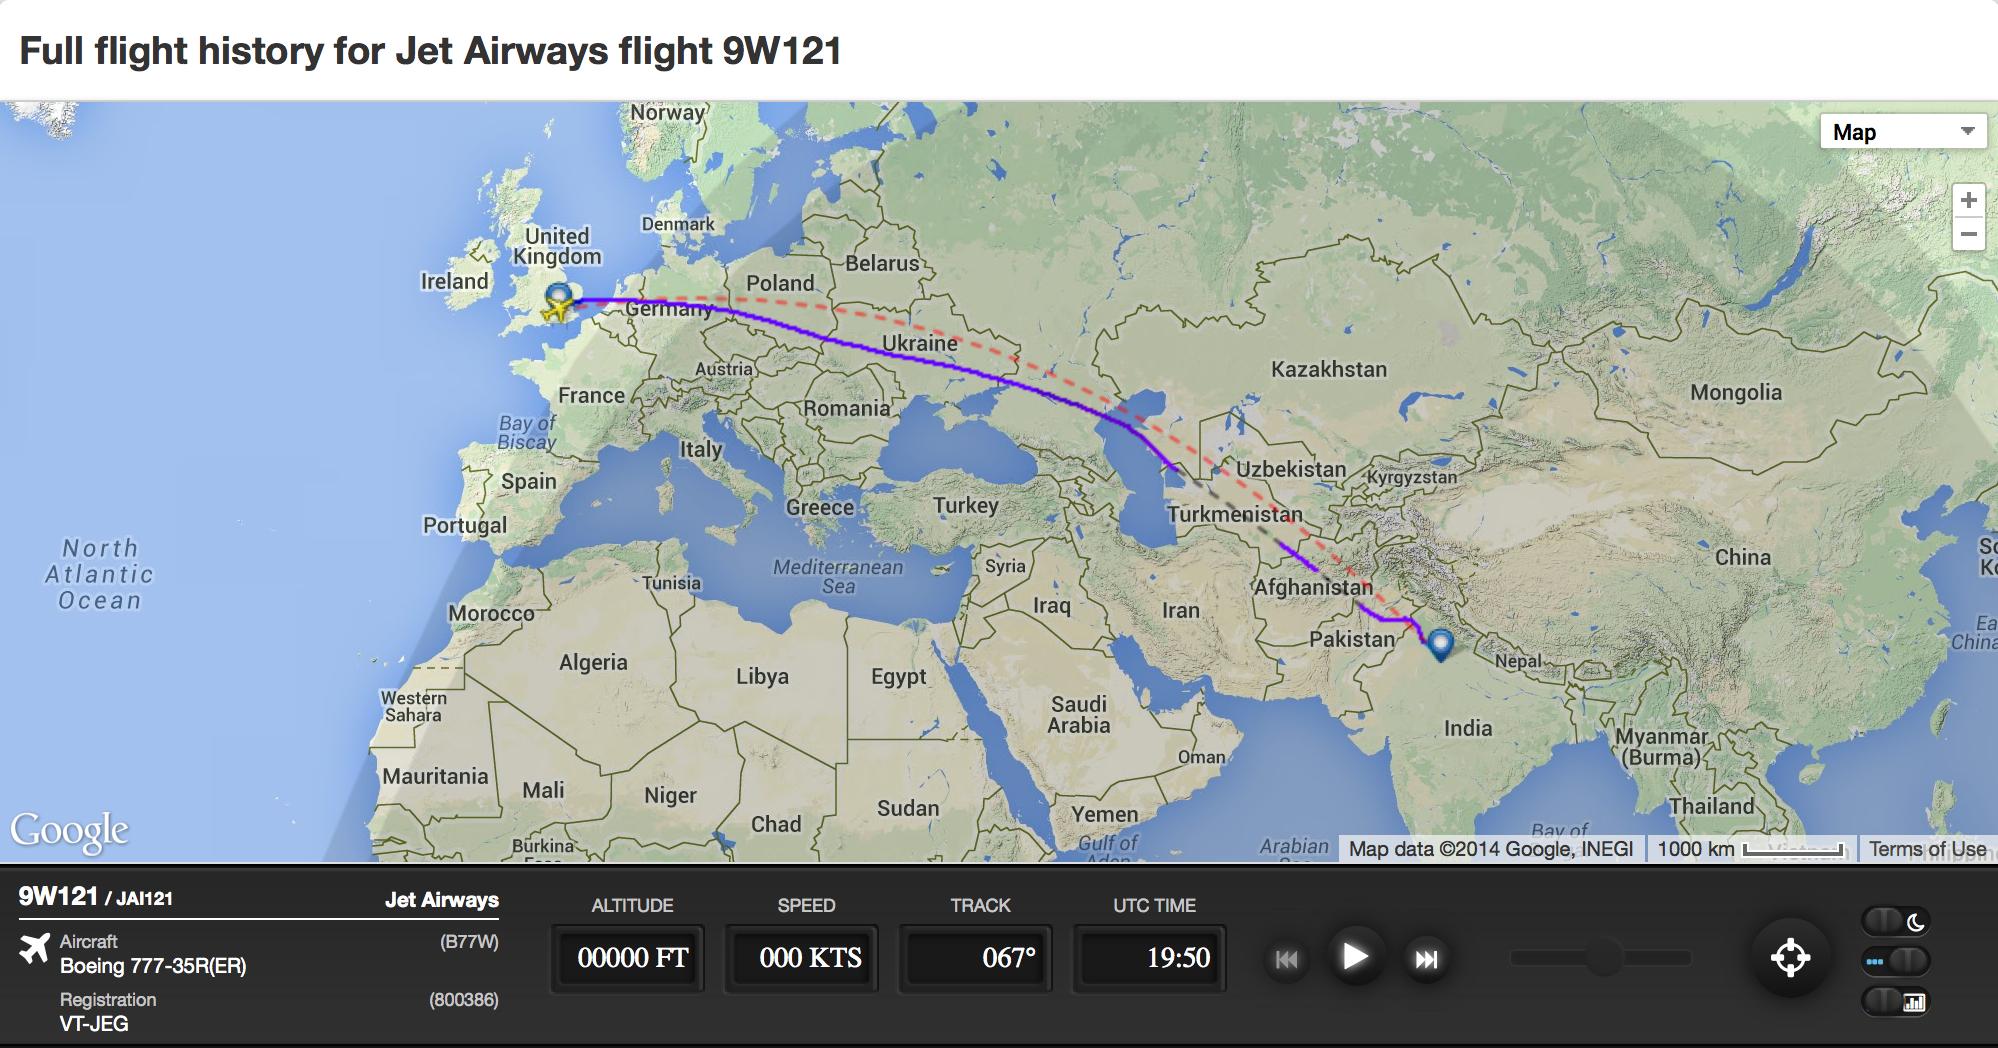 Radar data exposes Jet Airways\' lies on Ukraine over-flights #MH17 ...